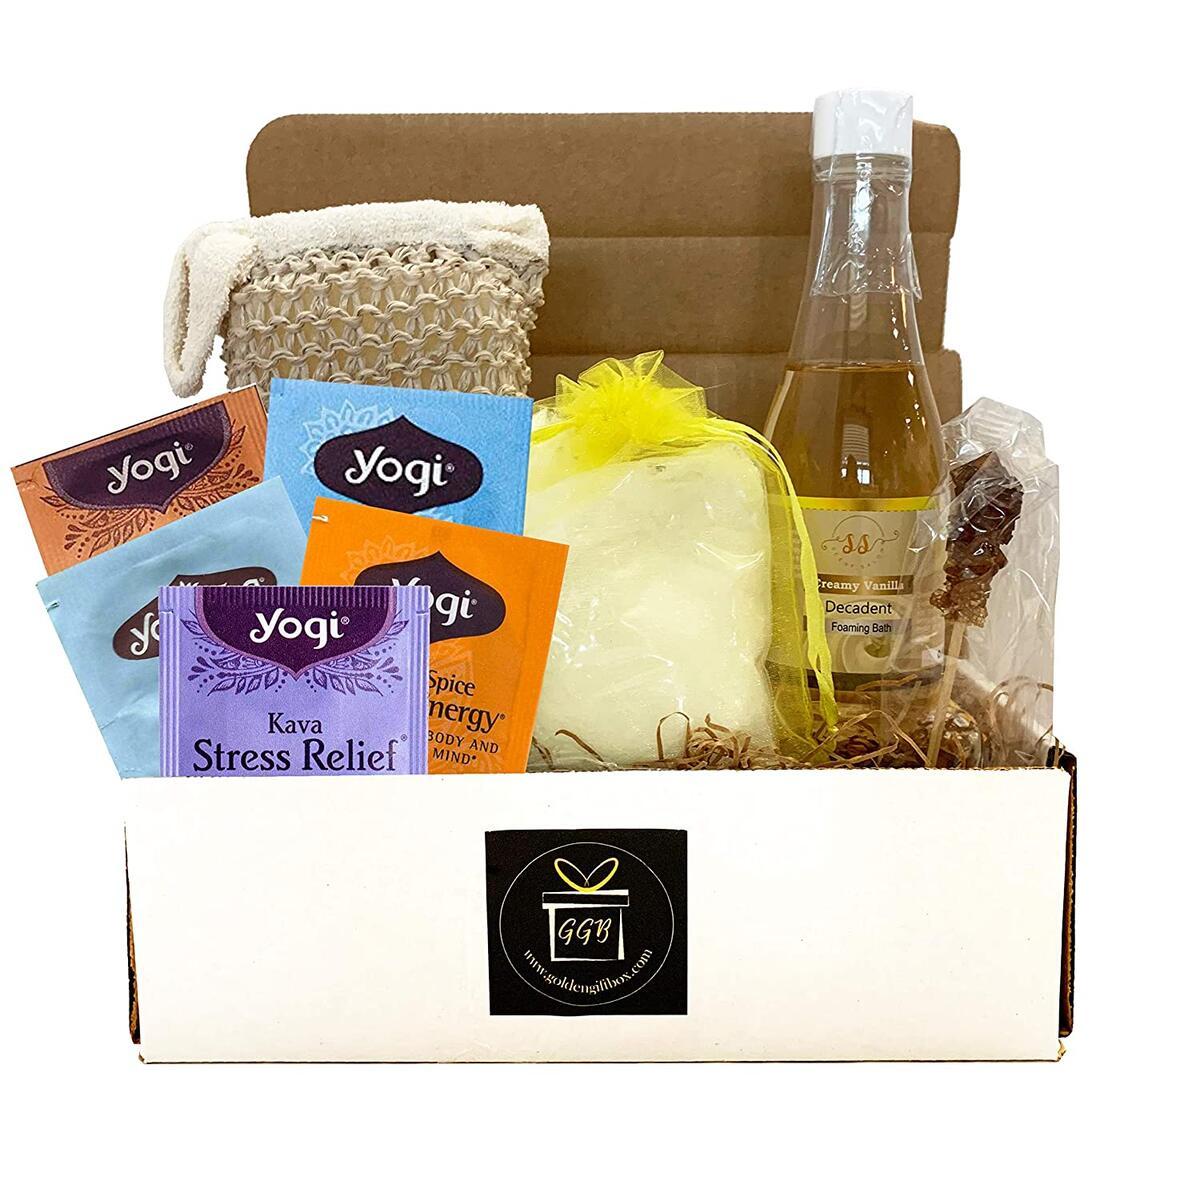 Home Spa Gift Basket For Women - CLASSIC EDITION - CREAMY VANILLA